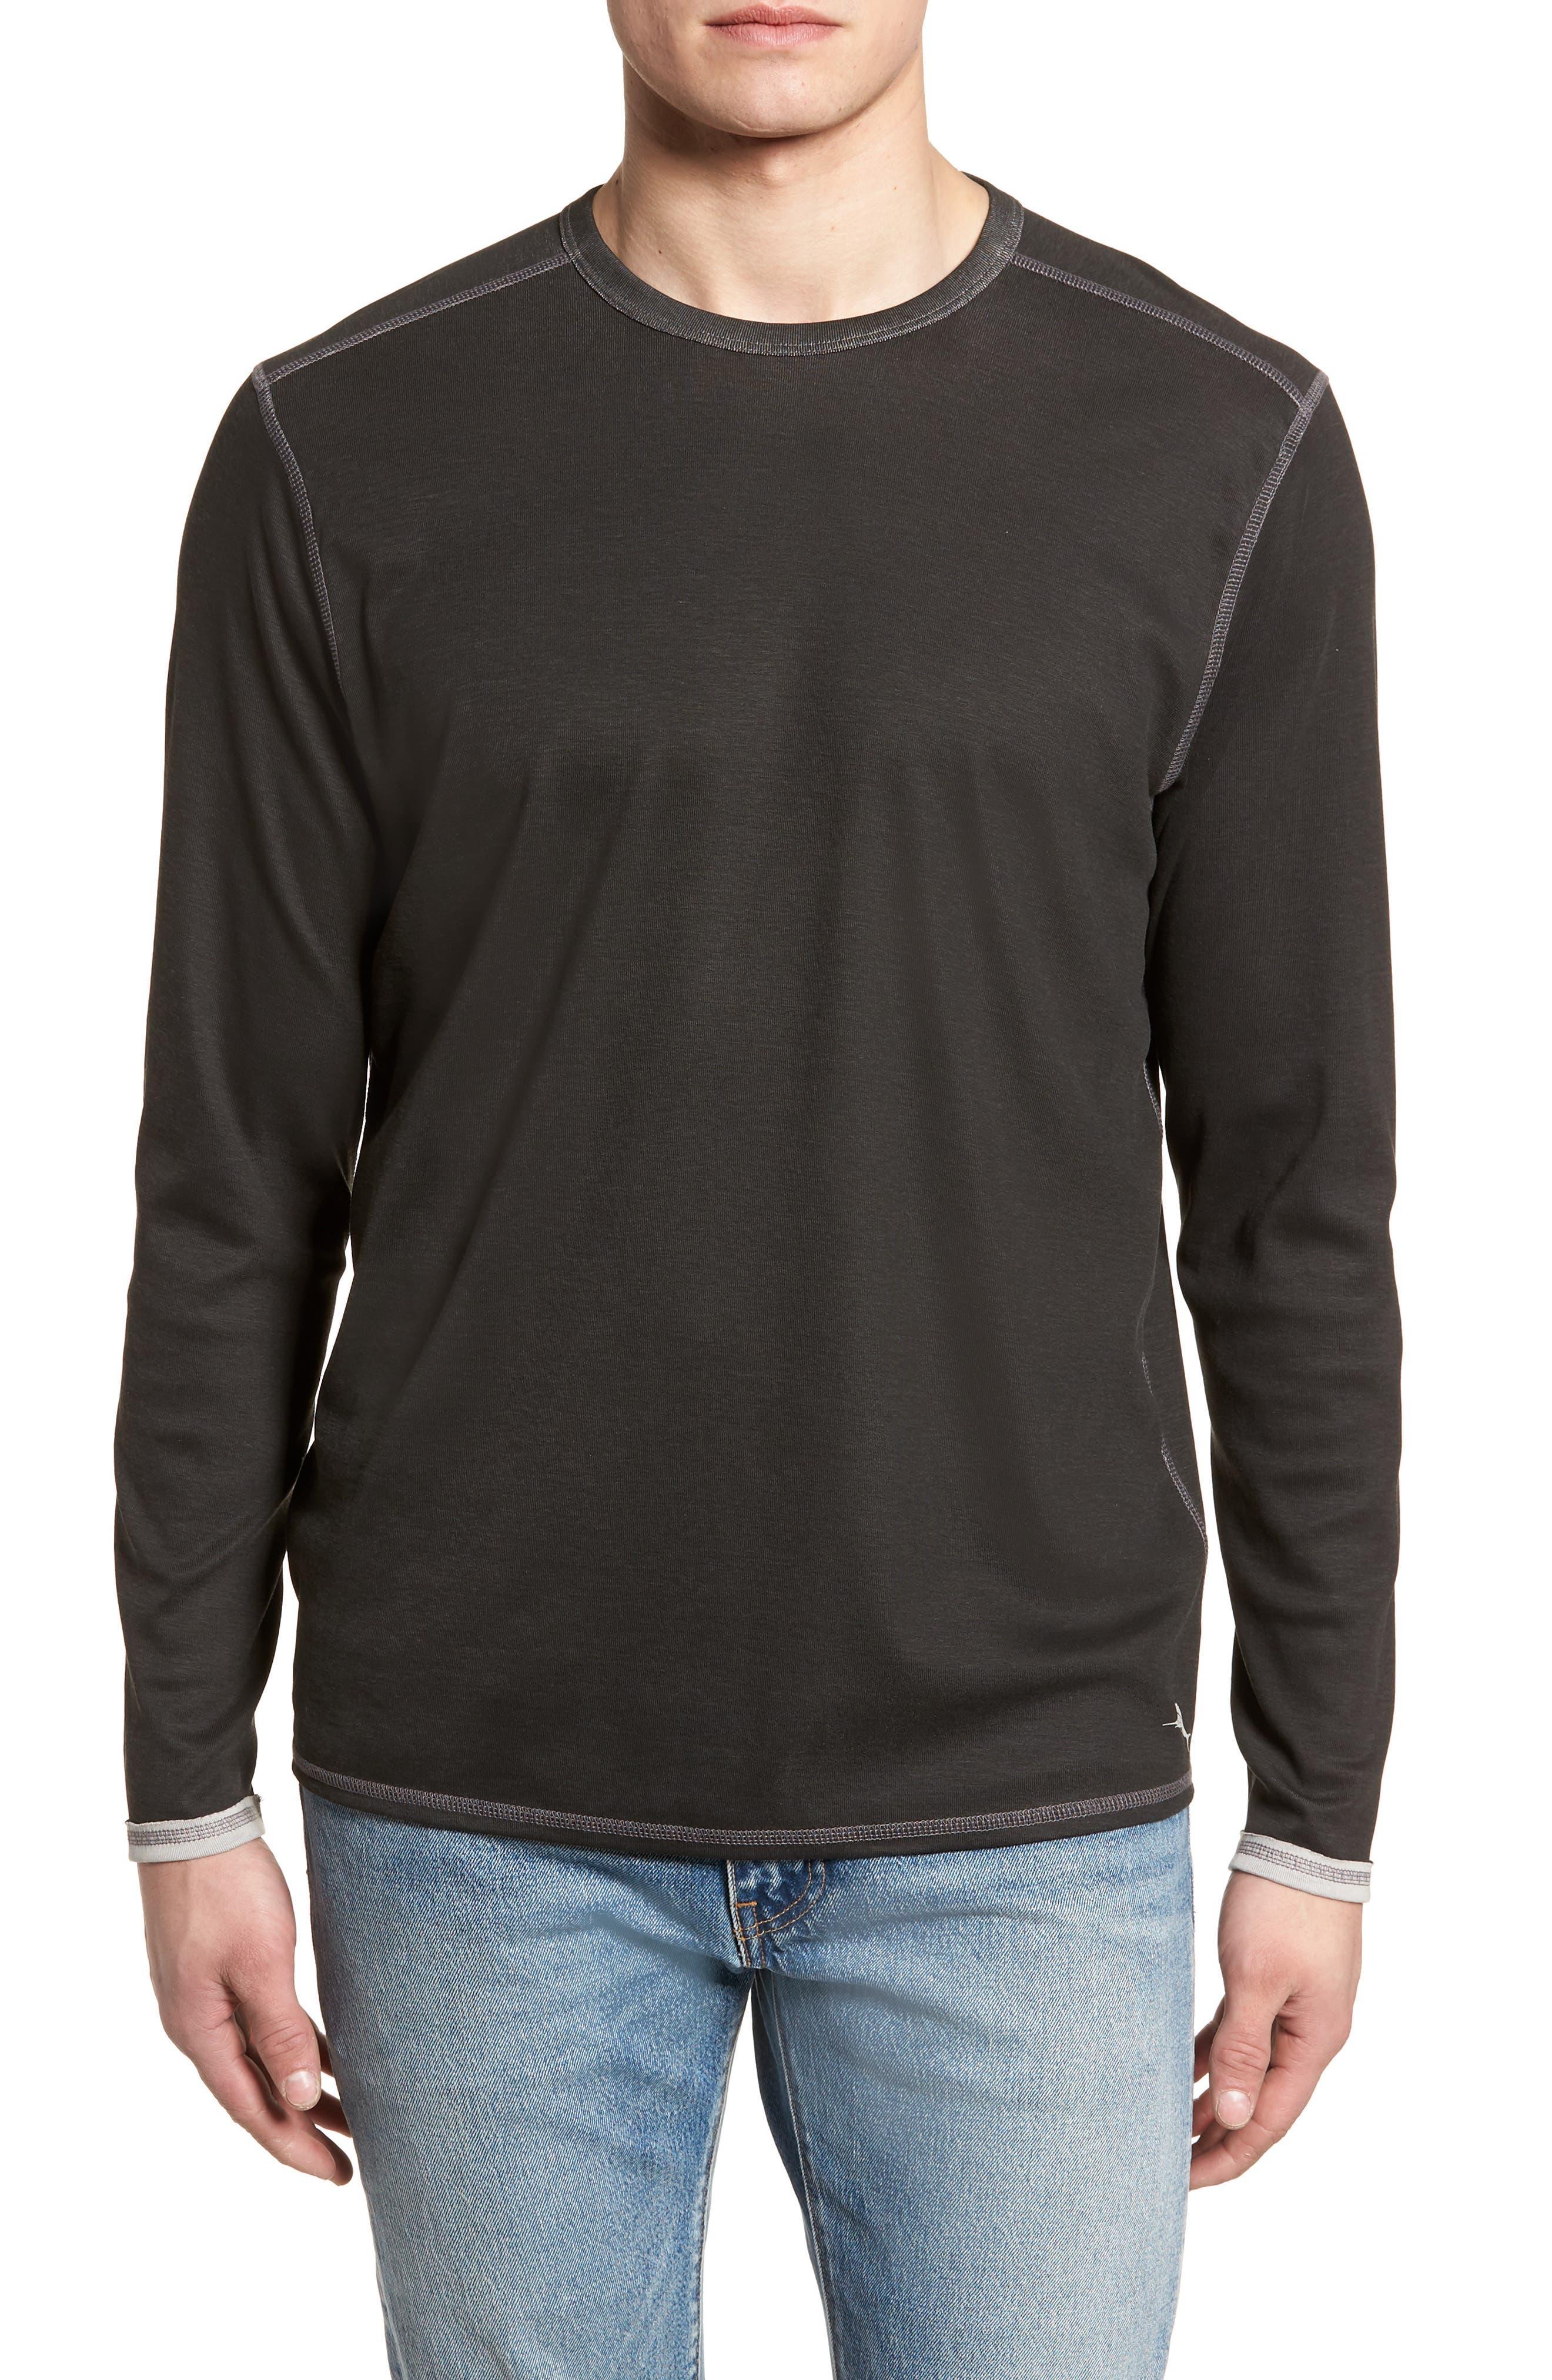 Dual in the Sun Reversible T-Shirt,                             Main thumbnail 1, color,                             Black